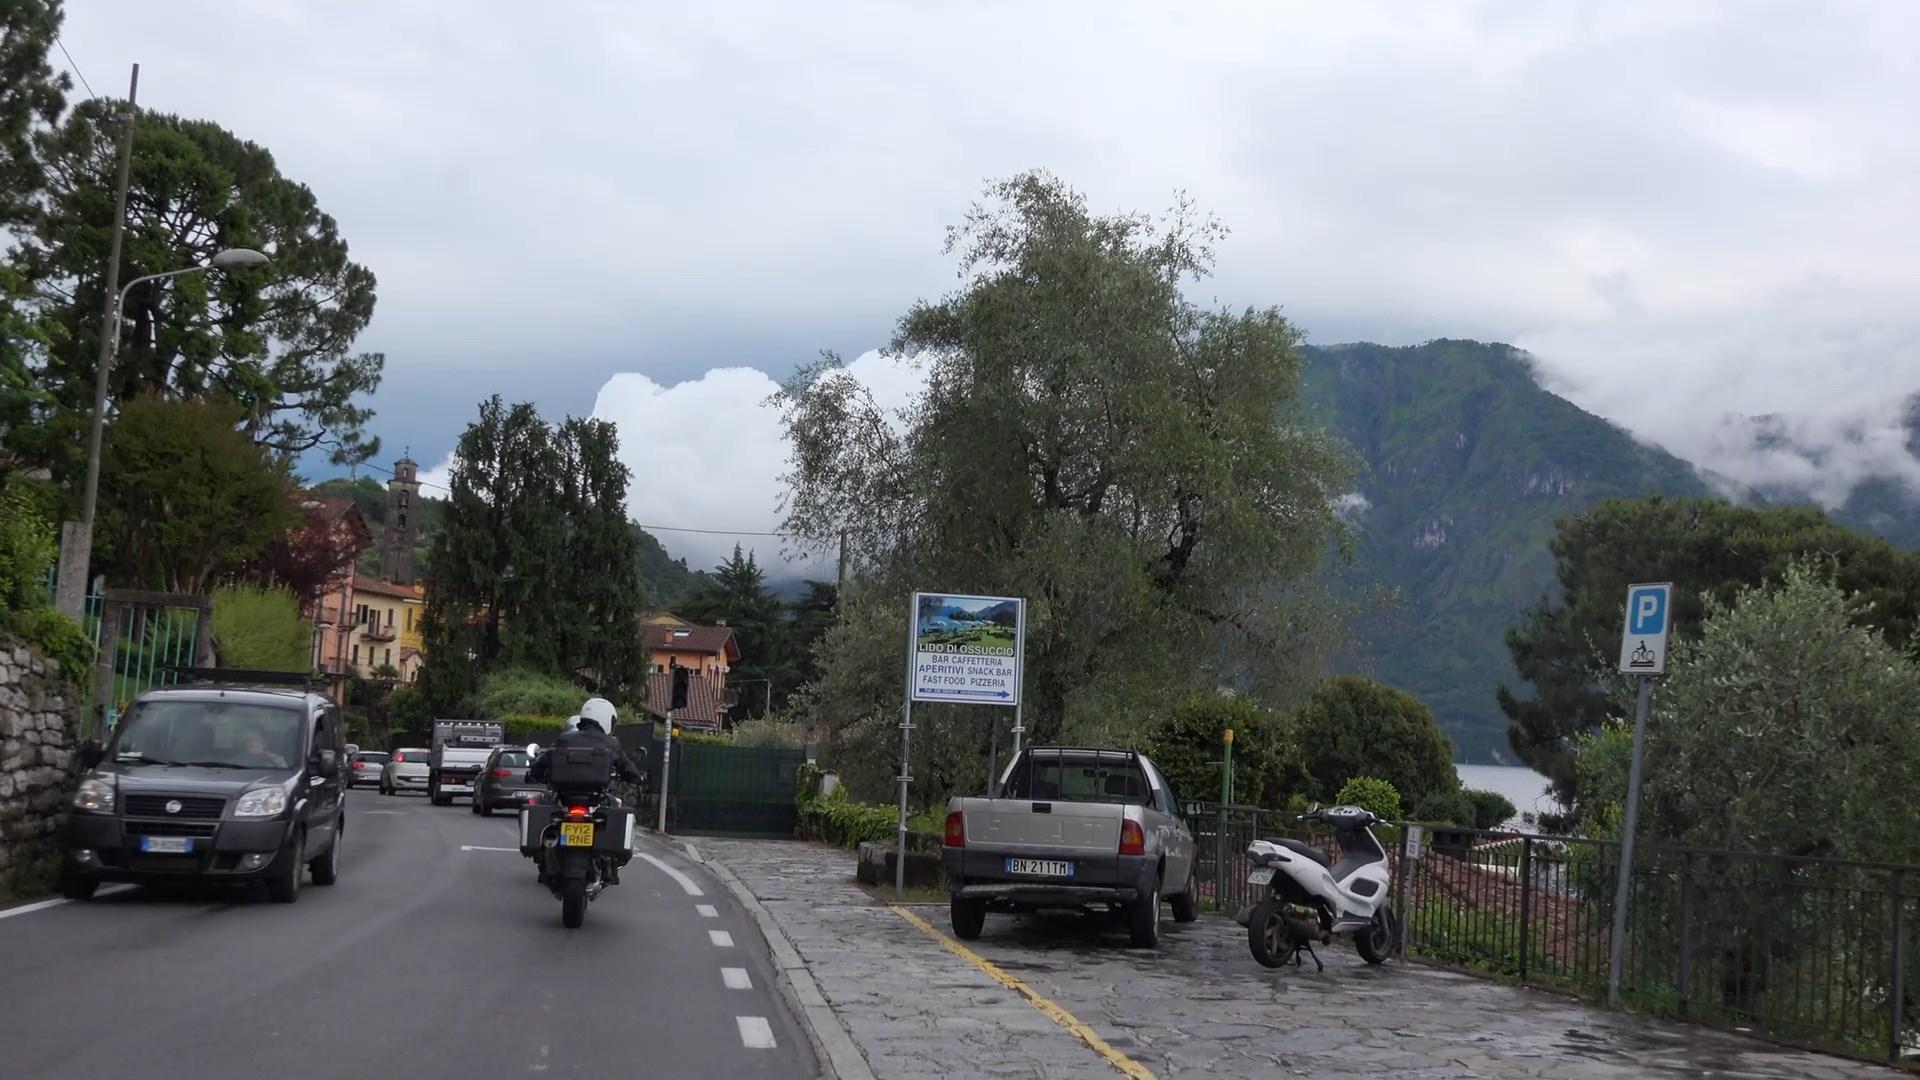 Part 2 of Lake Como Grand Tour. Gallery Image 6